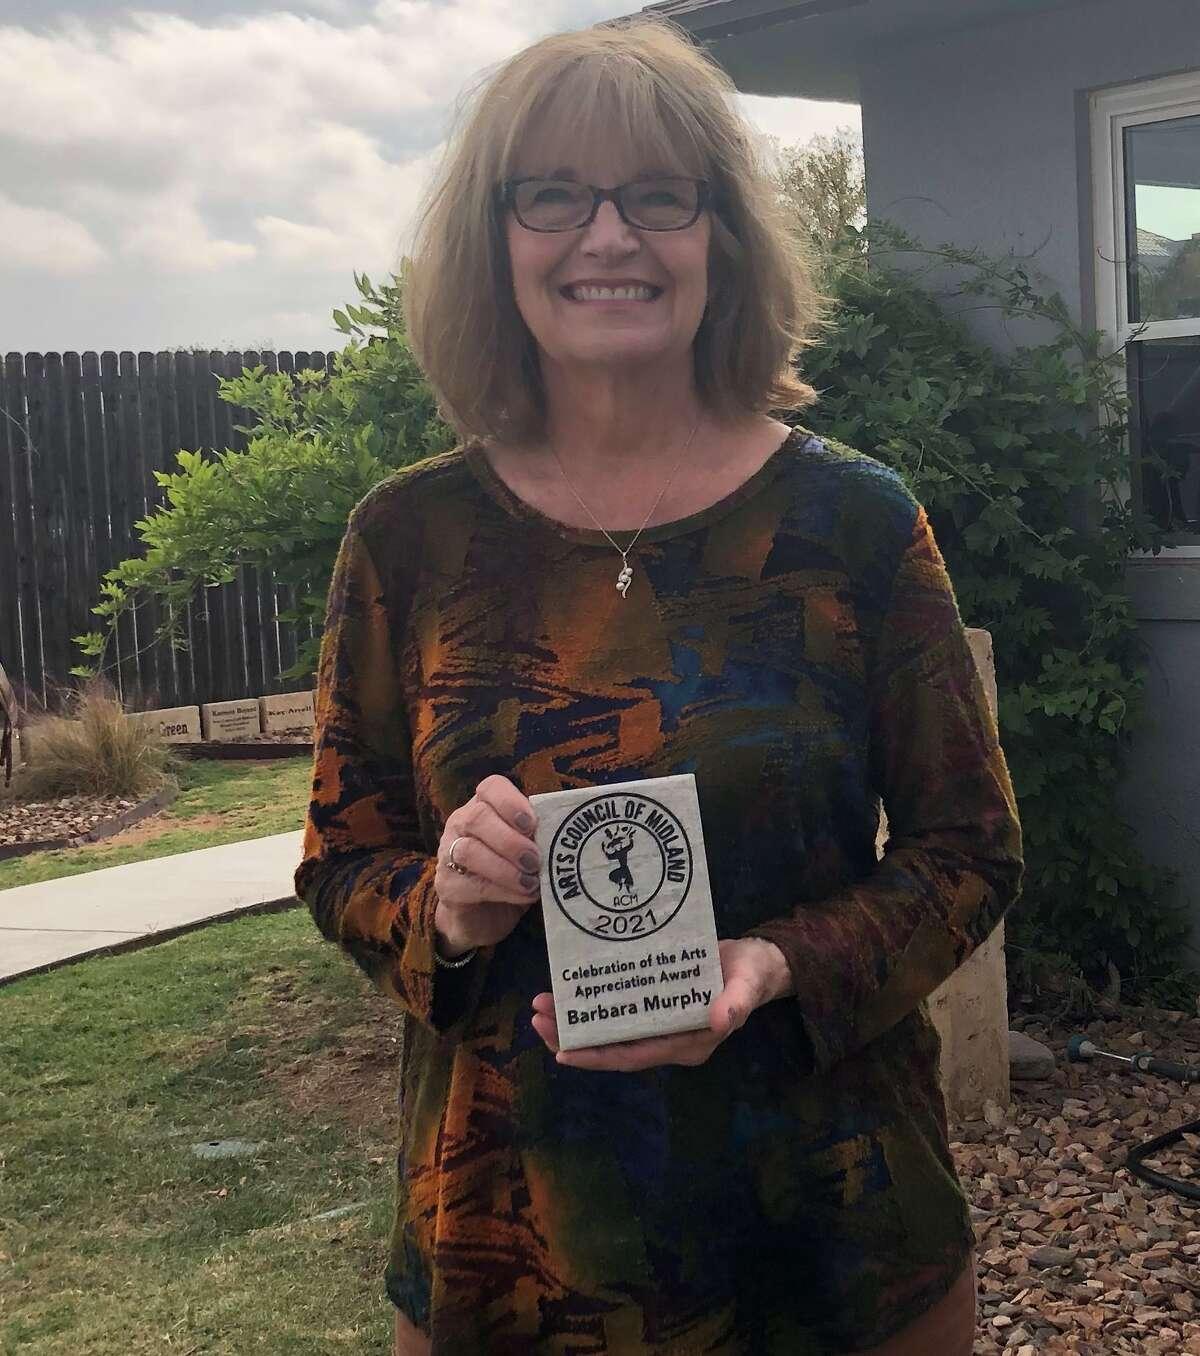 ACM's Celebration of the Arts Volunteer Barbara Murphy